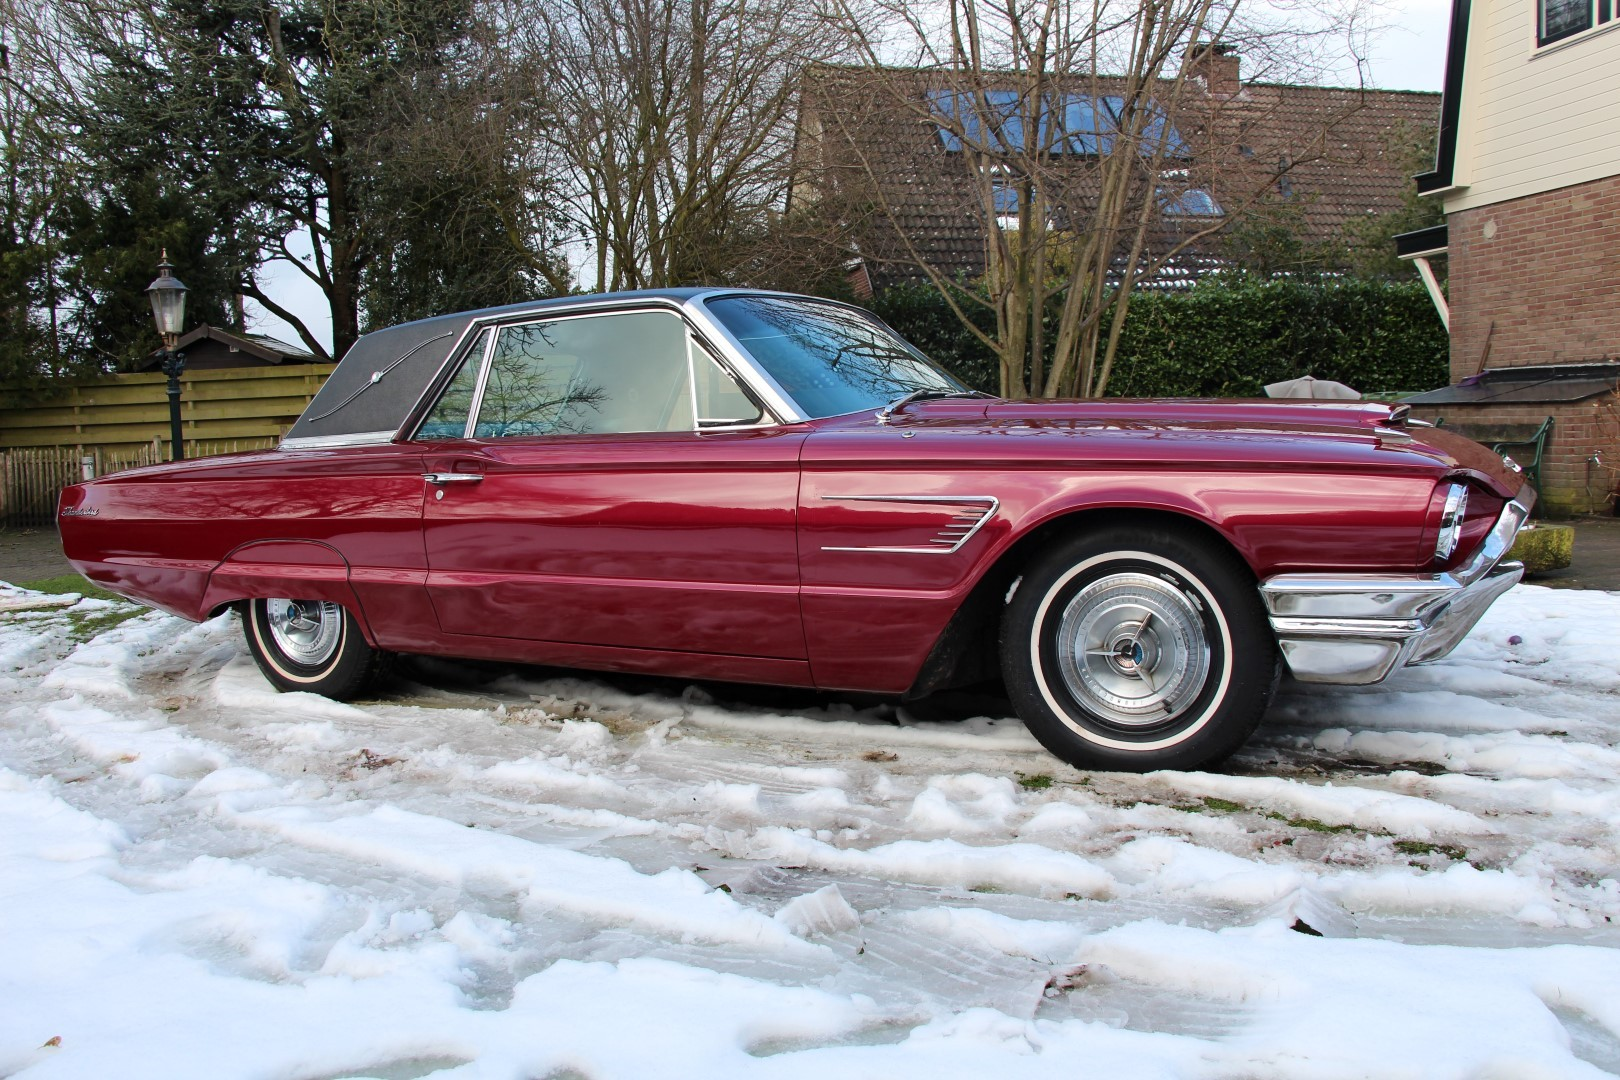 1965 Ford Thunderbird Hardtop - Burgundy new (17)